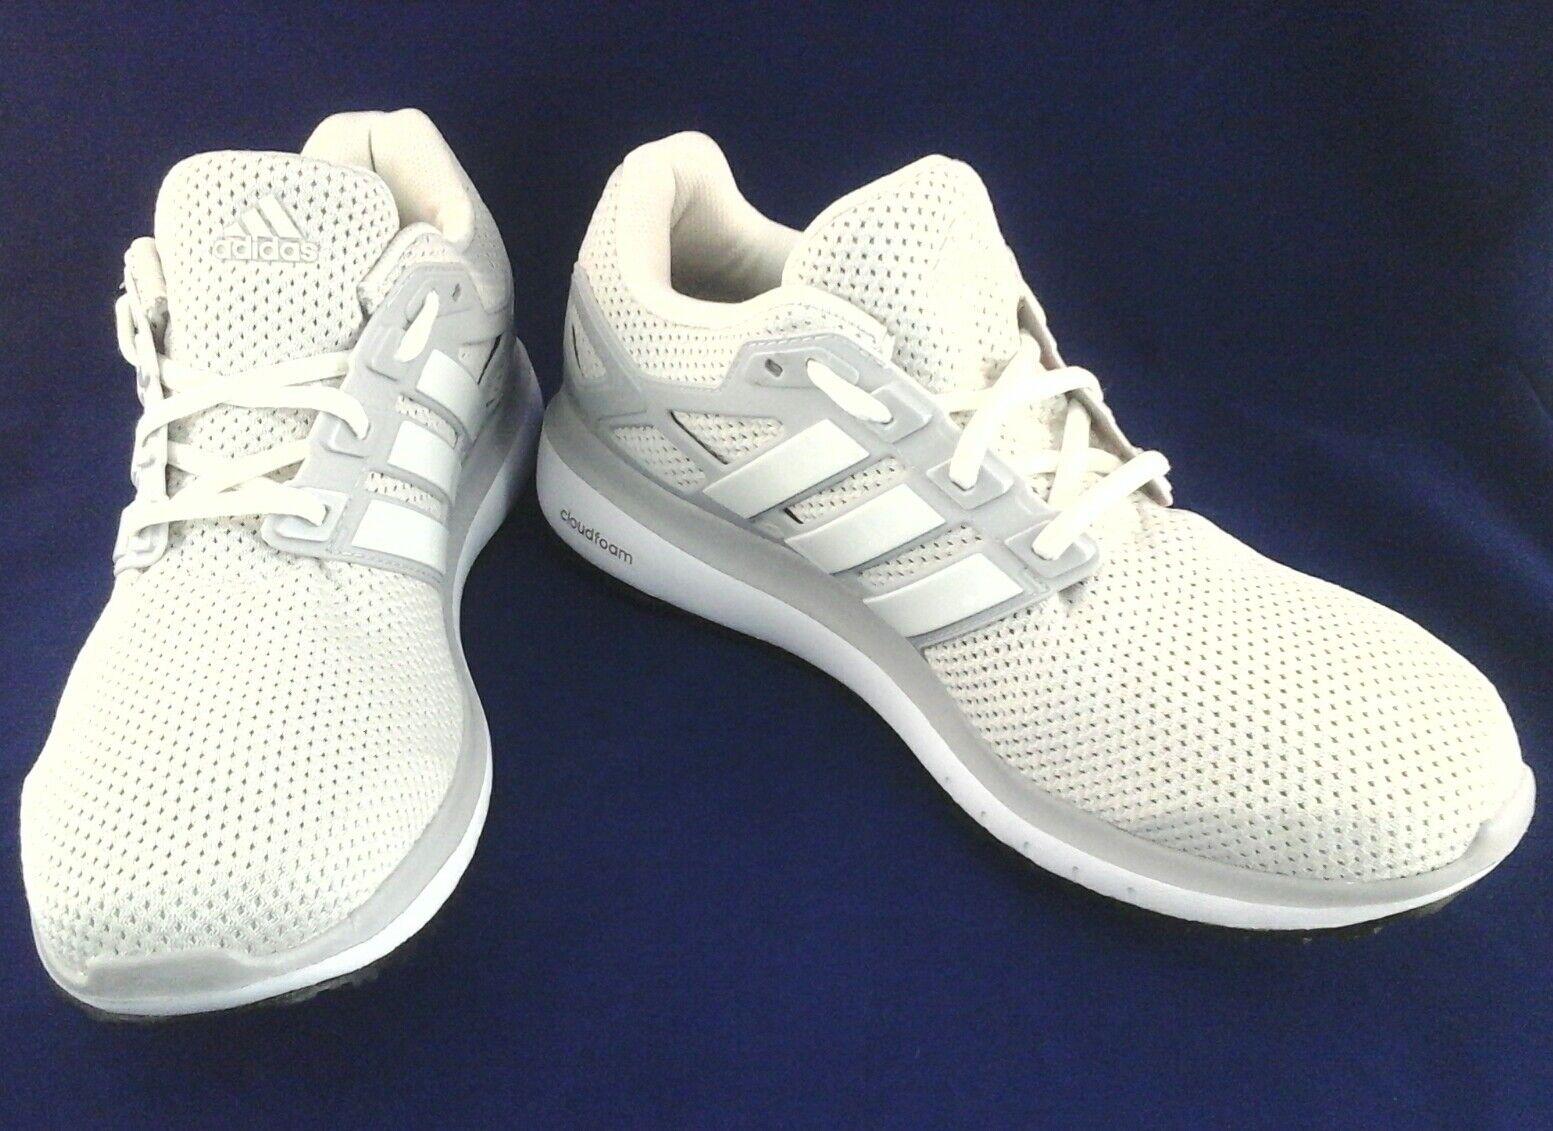 83f8bb432 Adidas Cloudfoam Ortholite Para hombre Zapatos Zapatos Zapatos para Caminar  Atléticos BA82018 EE. UU.